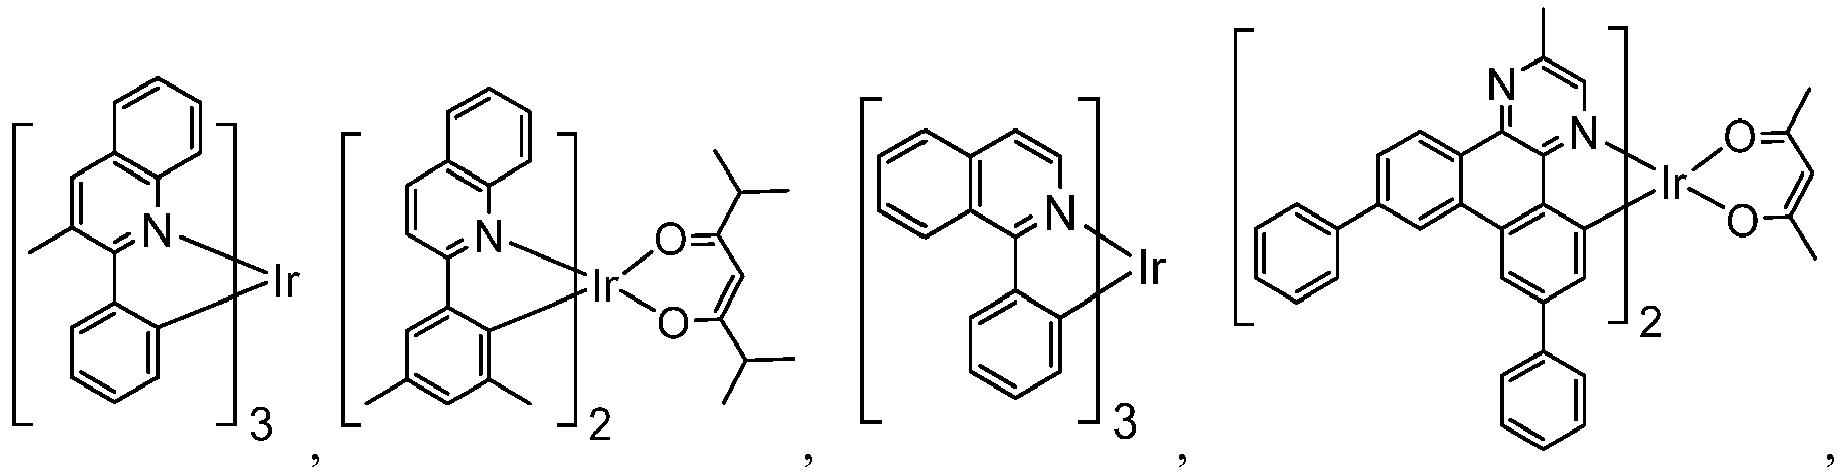 Figure imgb0910